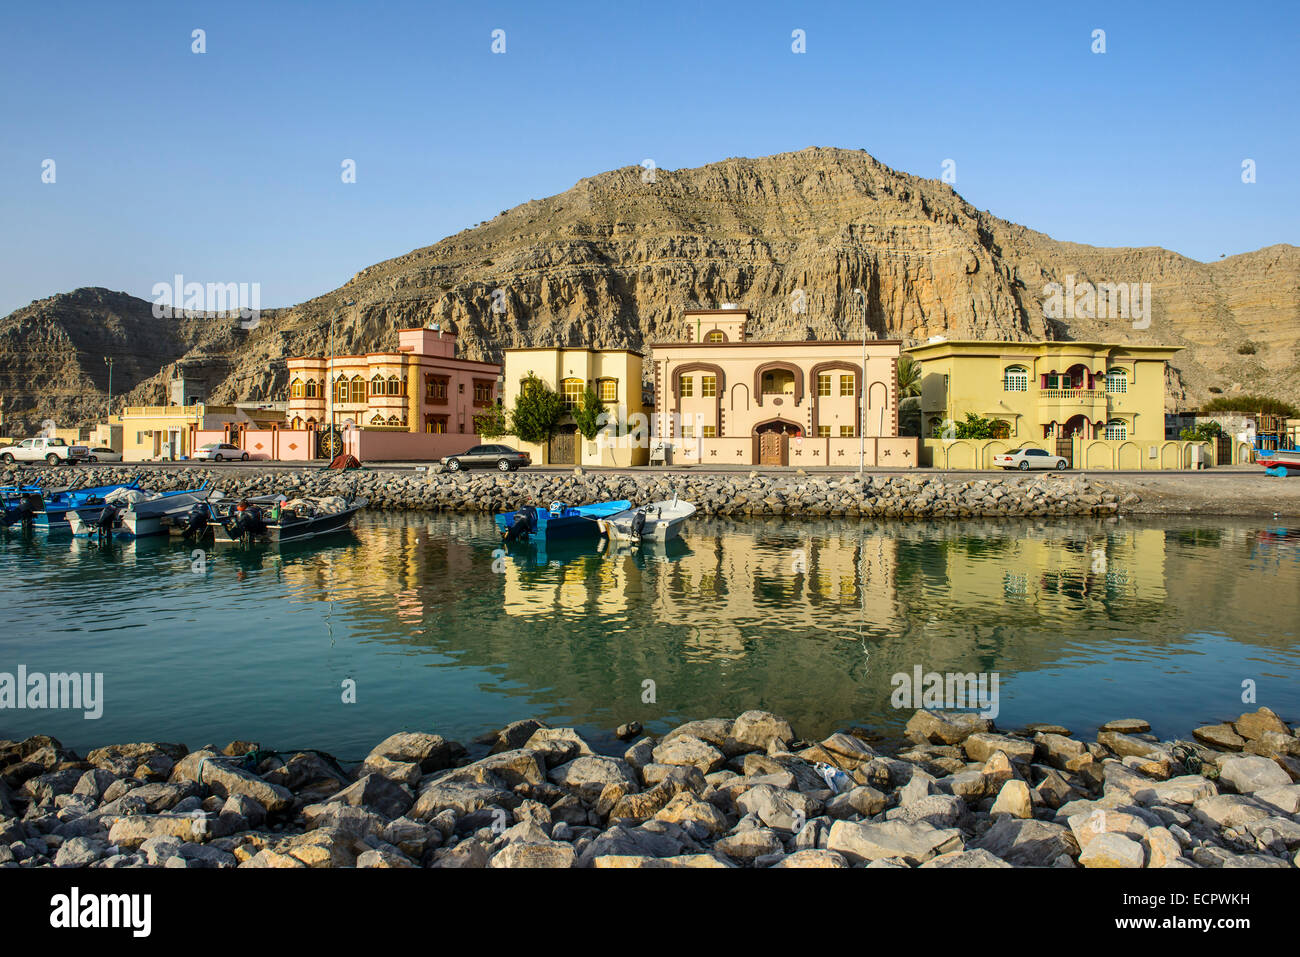 Houses on the water, Khasab, Musandam, Oman - Stock Image